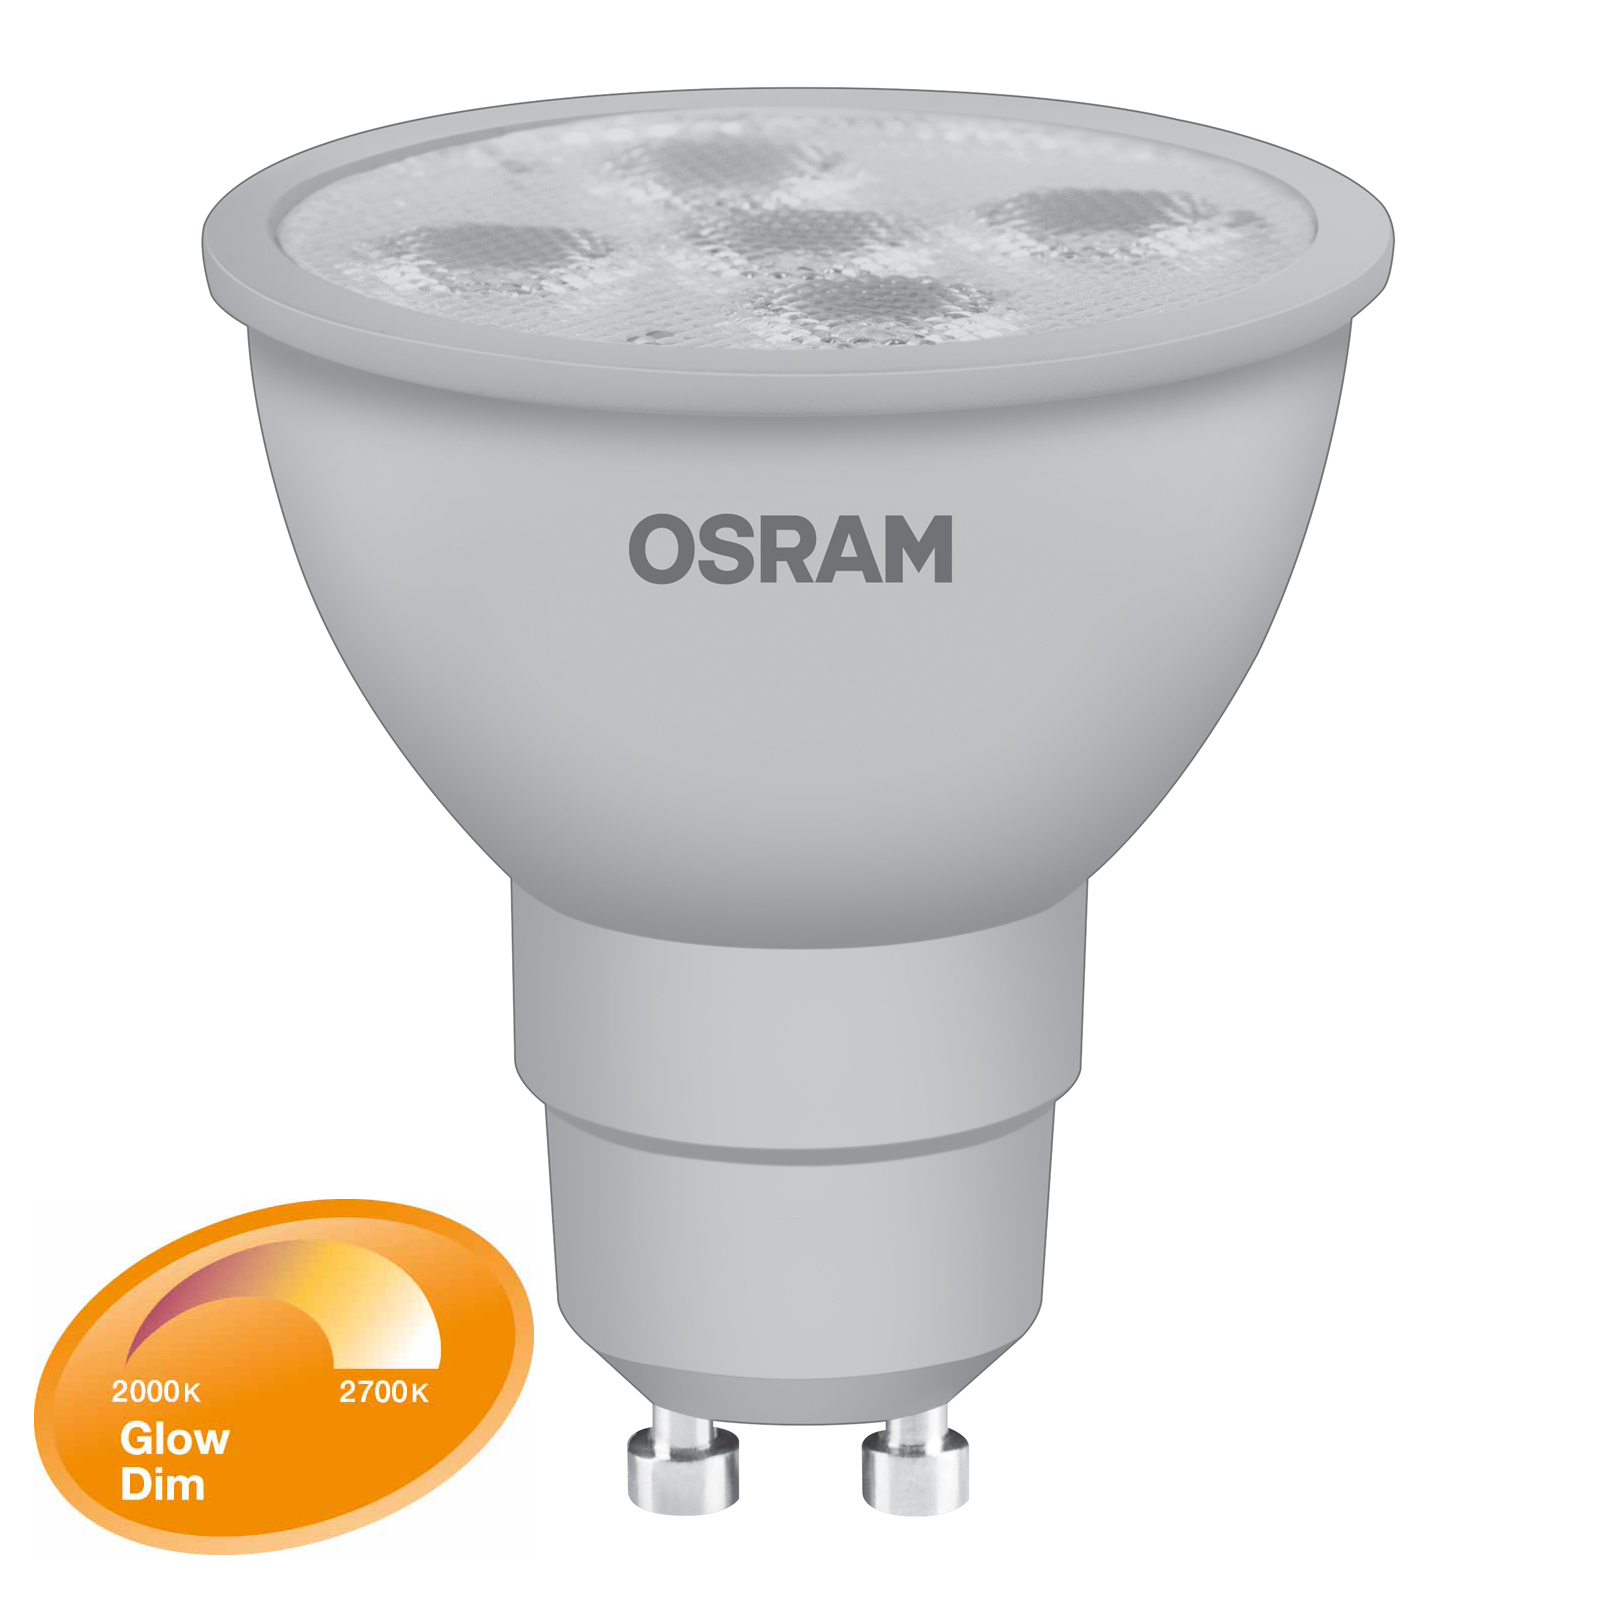 10517-OSRAM-GLOWdim-LED-Spot-GU10-5W-Ersatz-fuer-48-Watt-330-Lumen-warmweiss-dimmbar-1 Verwunderlich Gu10 Led Dimmbar Dekorationen